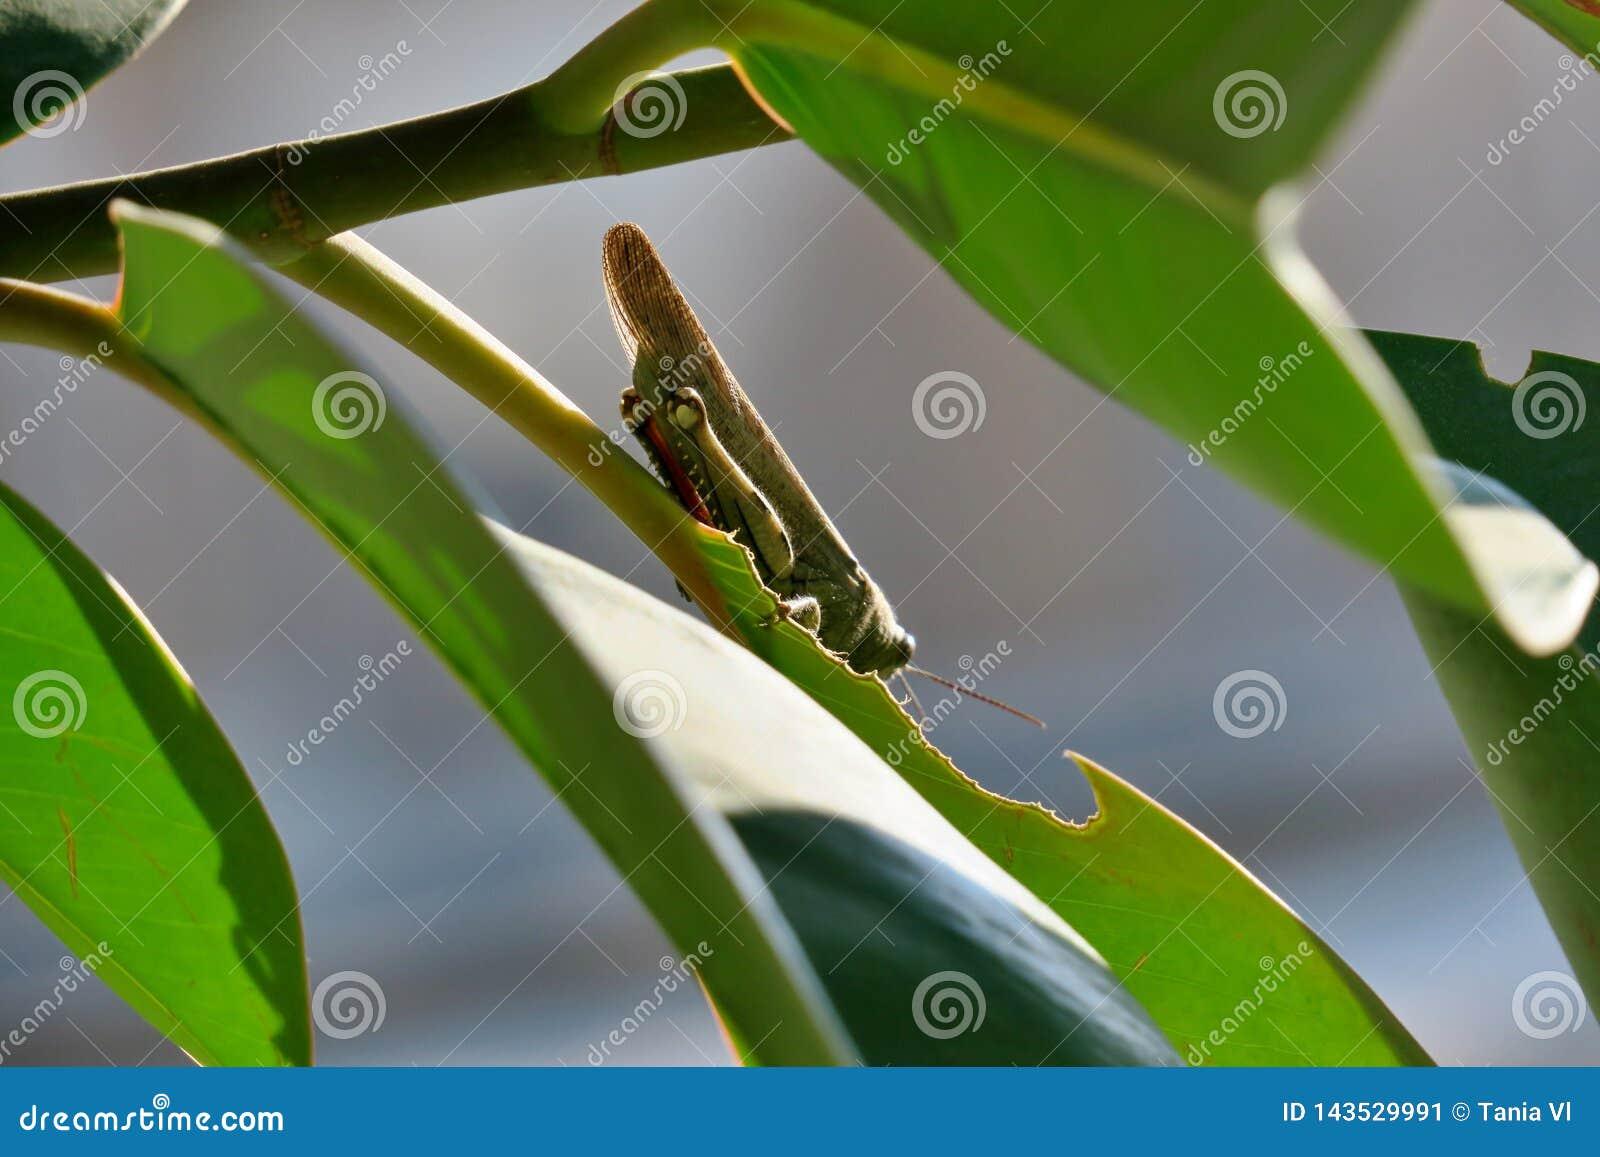 Green grasshopper on tree eating leaf